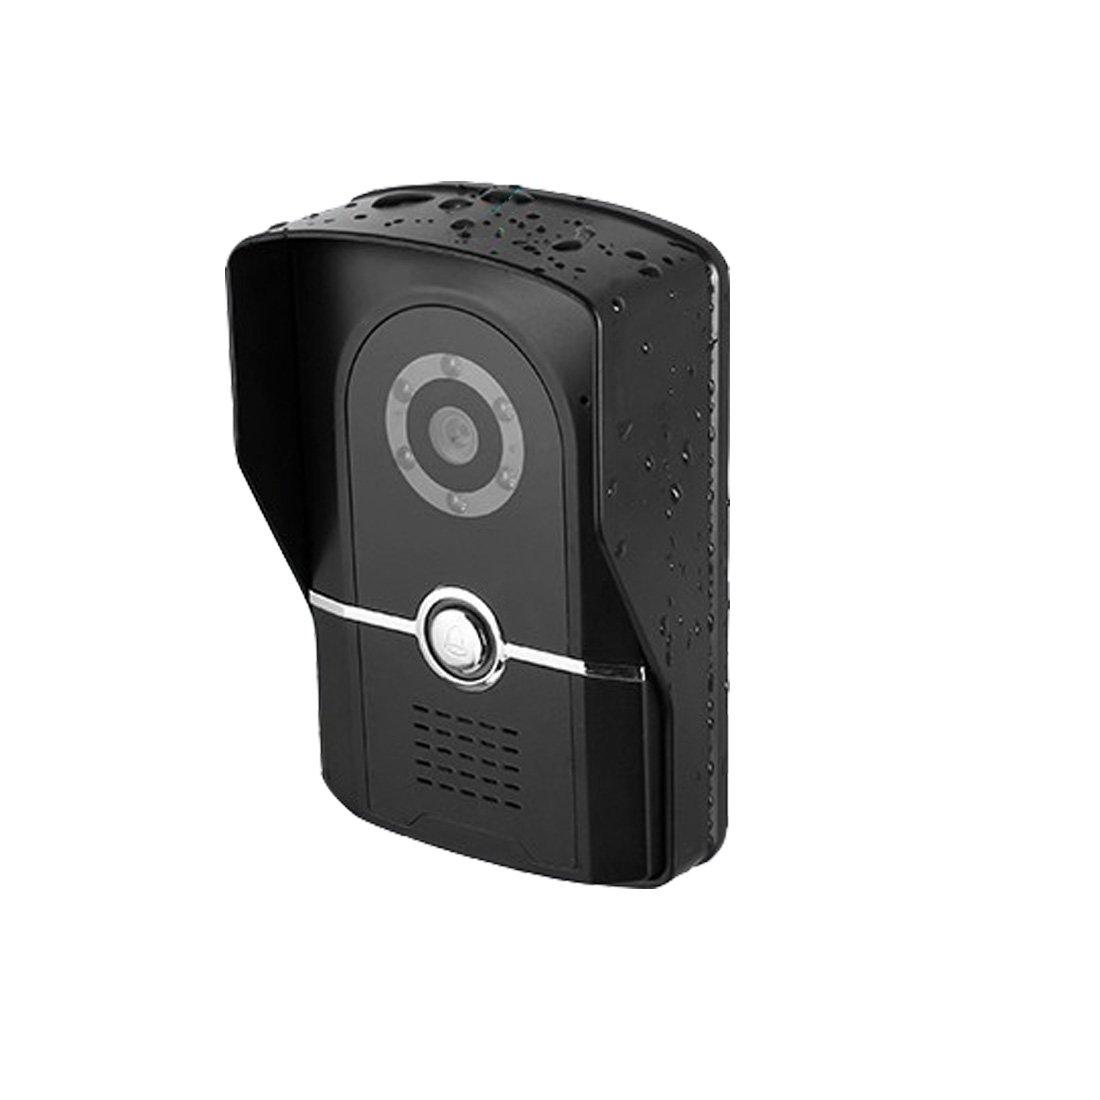 Unbekannt Video Türklingel Wireless 1080P-HD-Video, Zwei-Wege-Gespräch, Bewegungserkennung, WLAN, PIR-Bewegungserkennung Bei